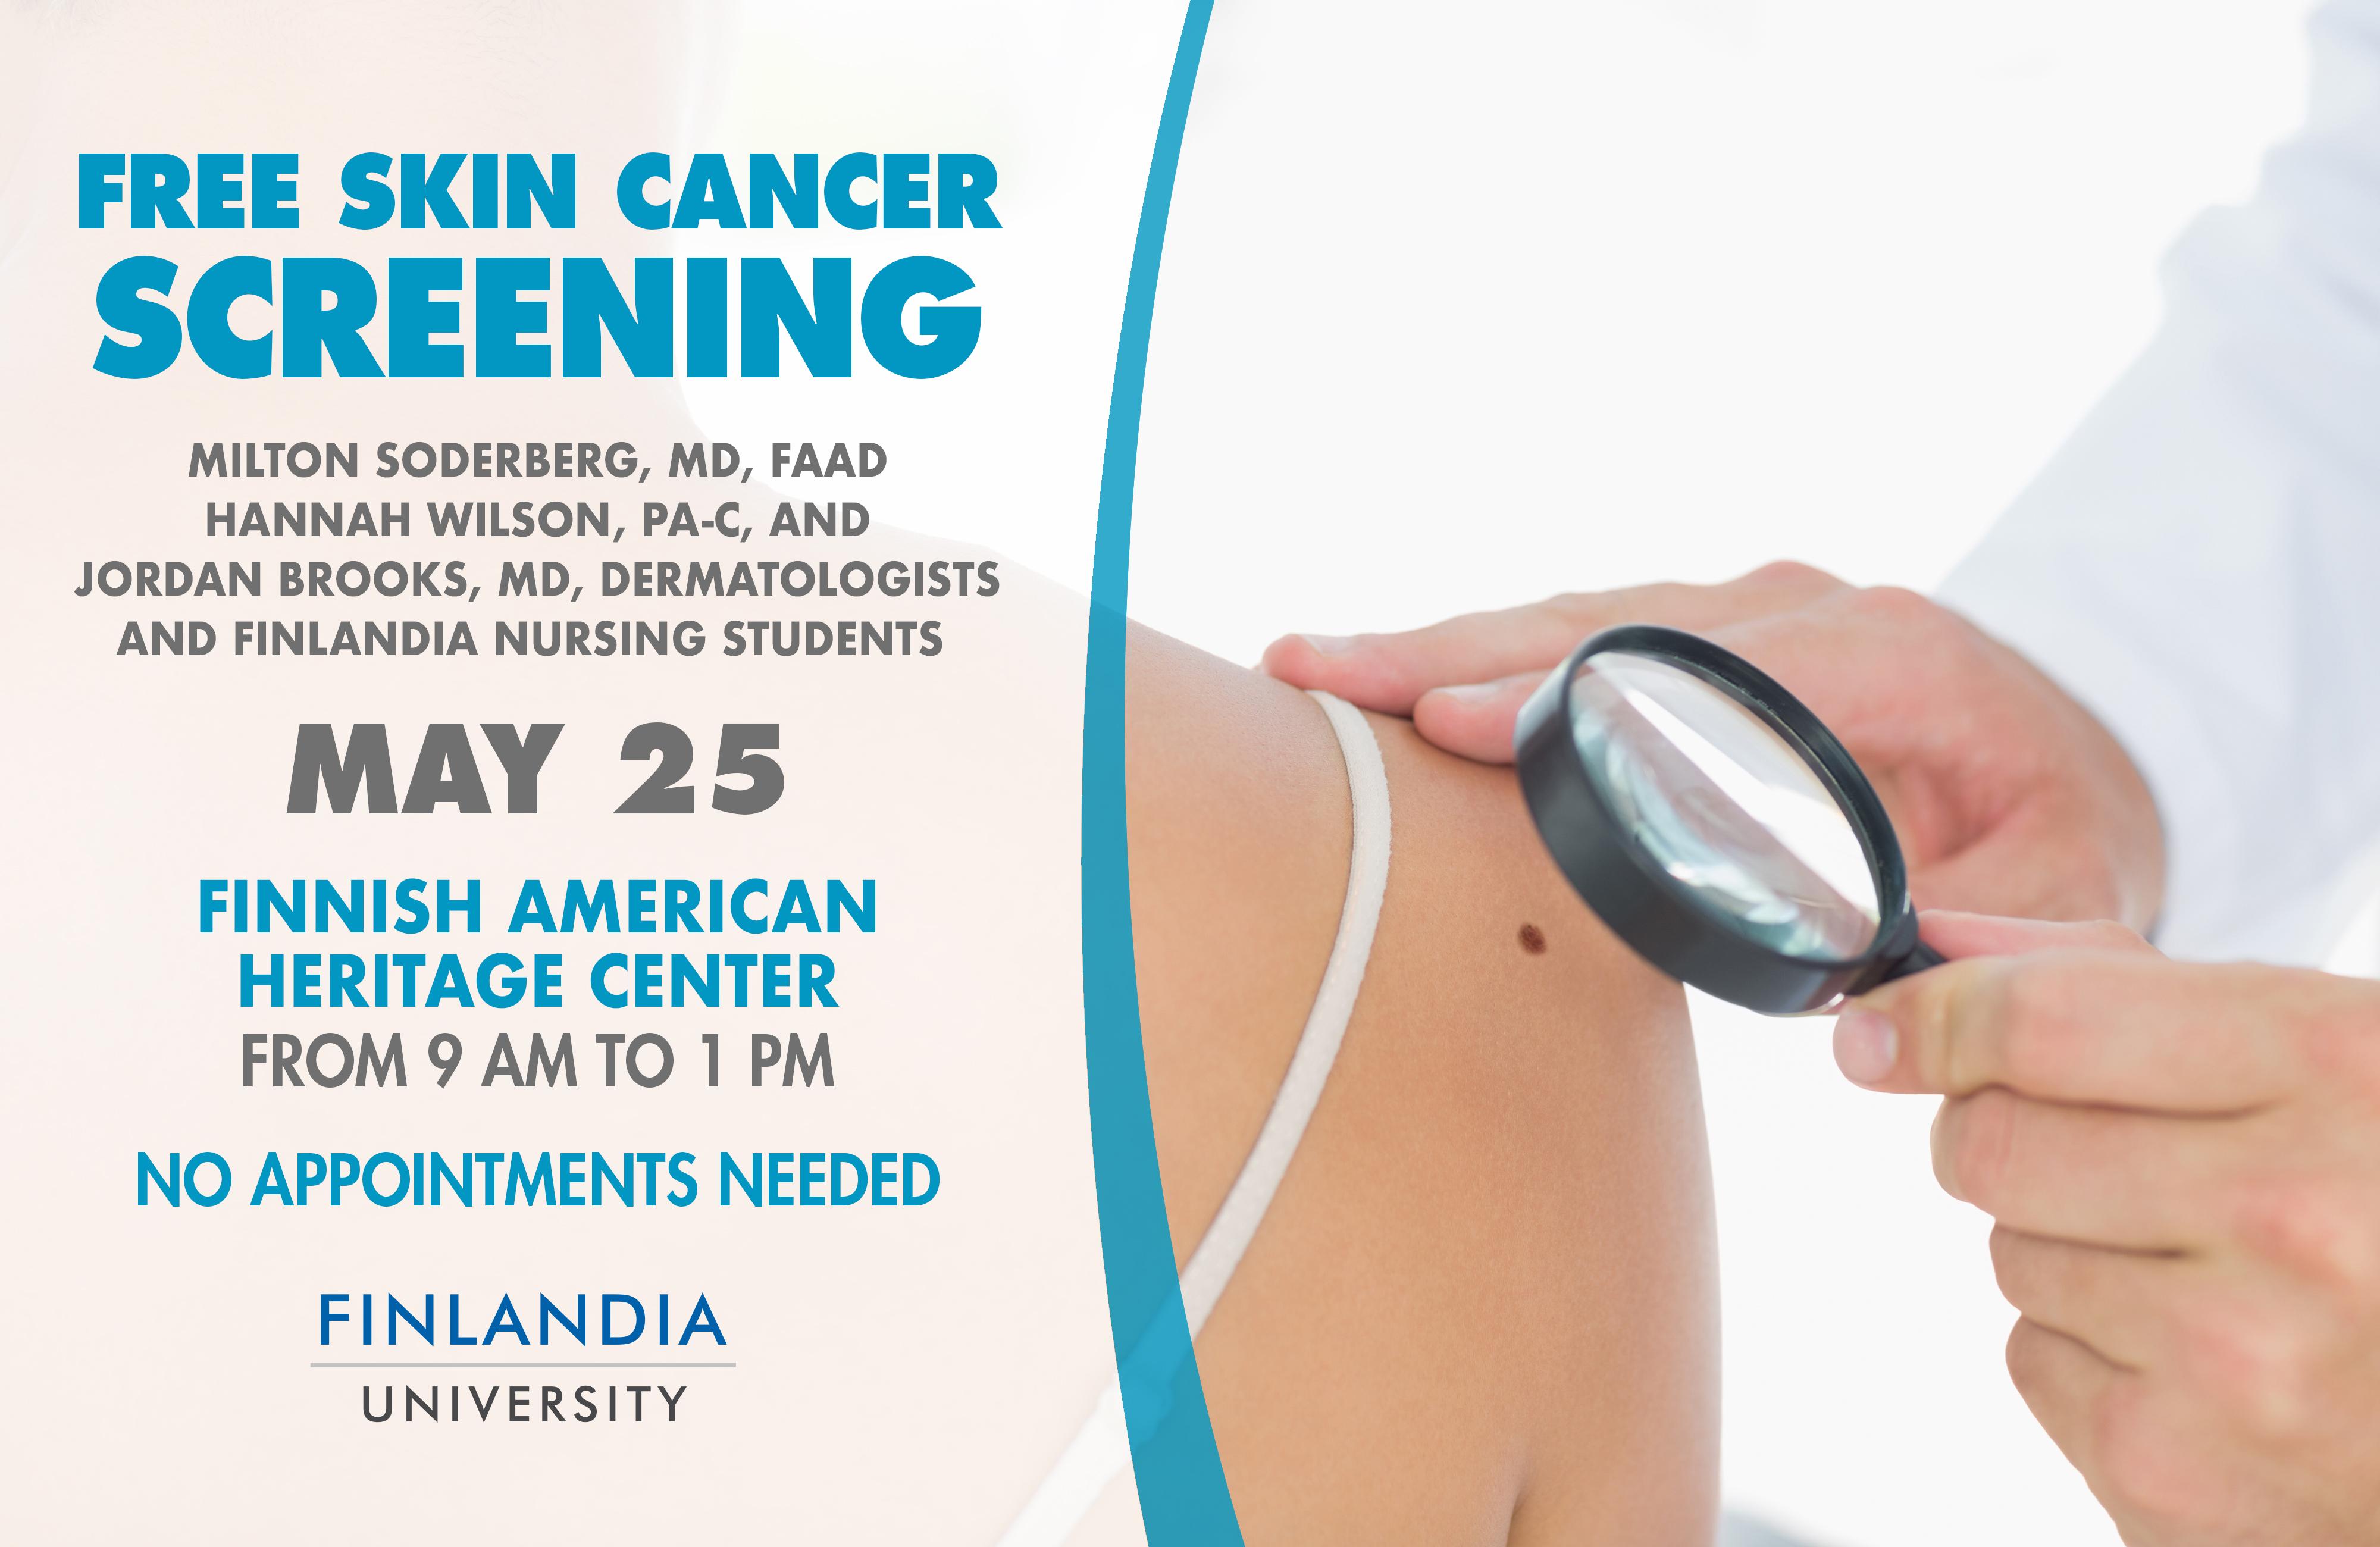 free skin cancer screening near me 2019